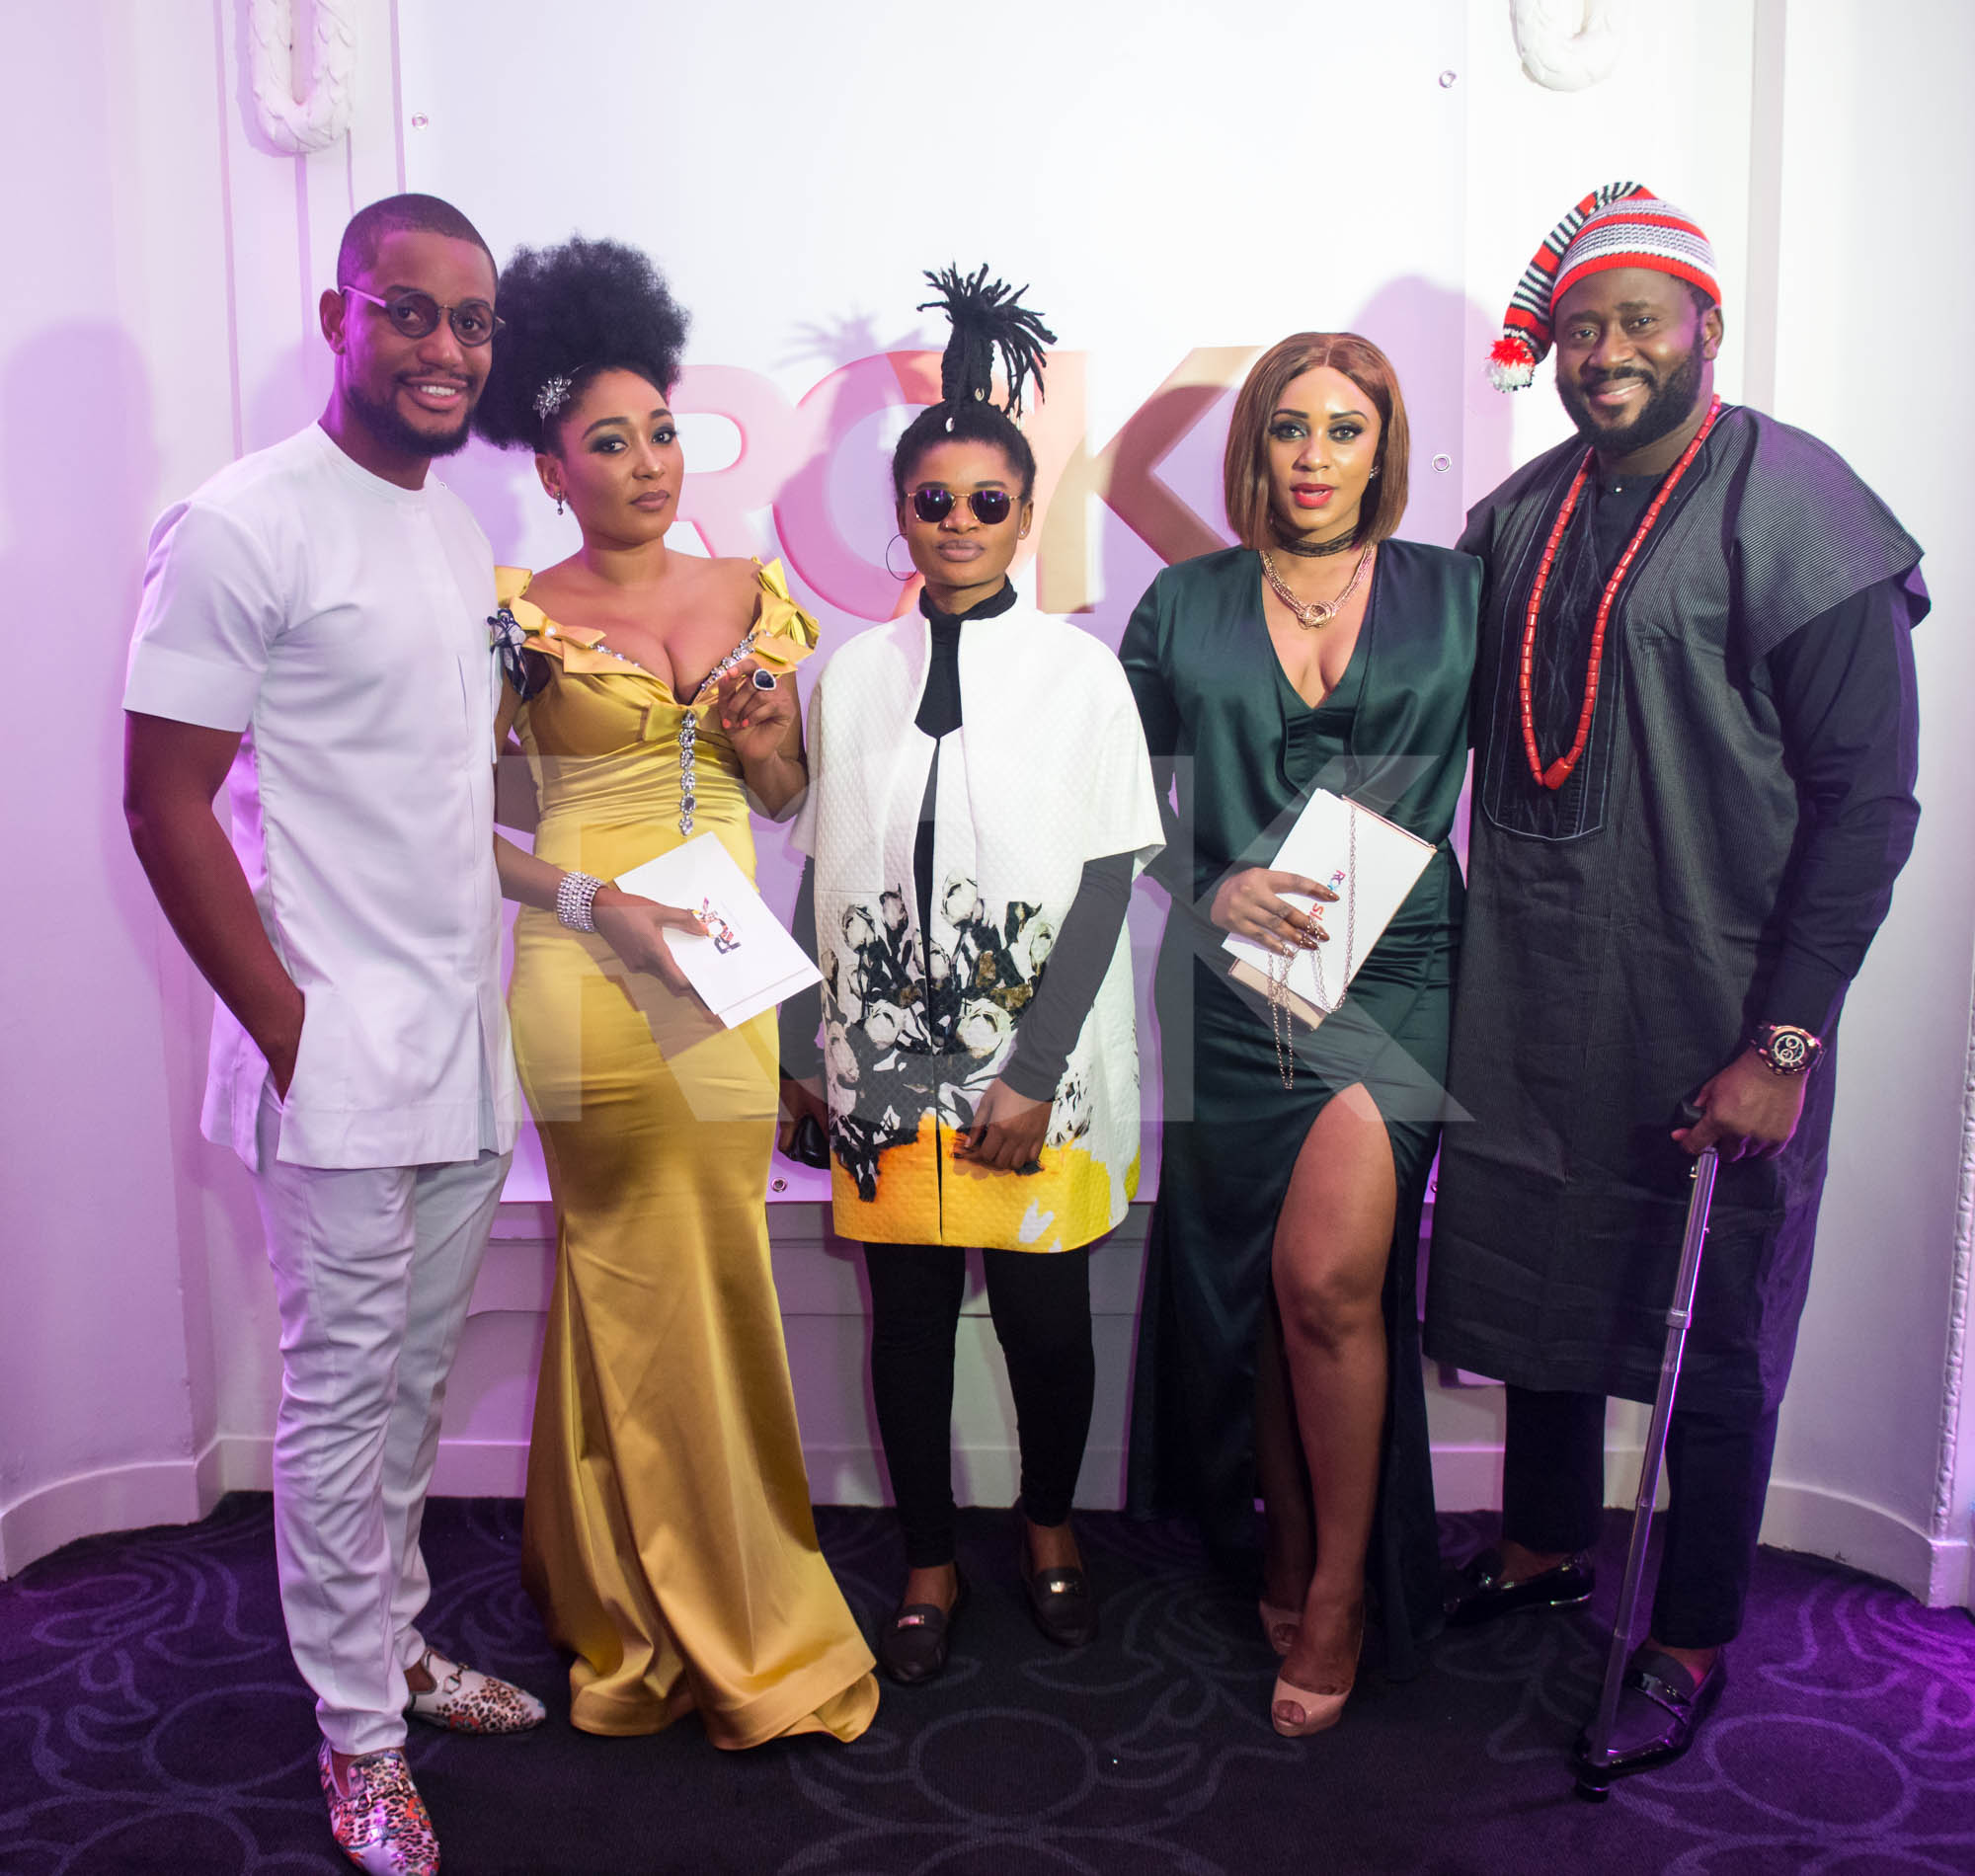 rokonsky-launch-shuts-down-london-with-mary-njoku-nollywood-stars-47